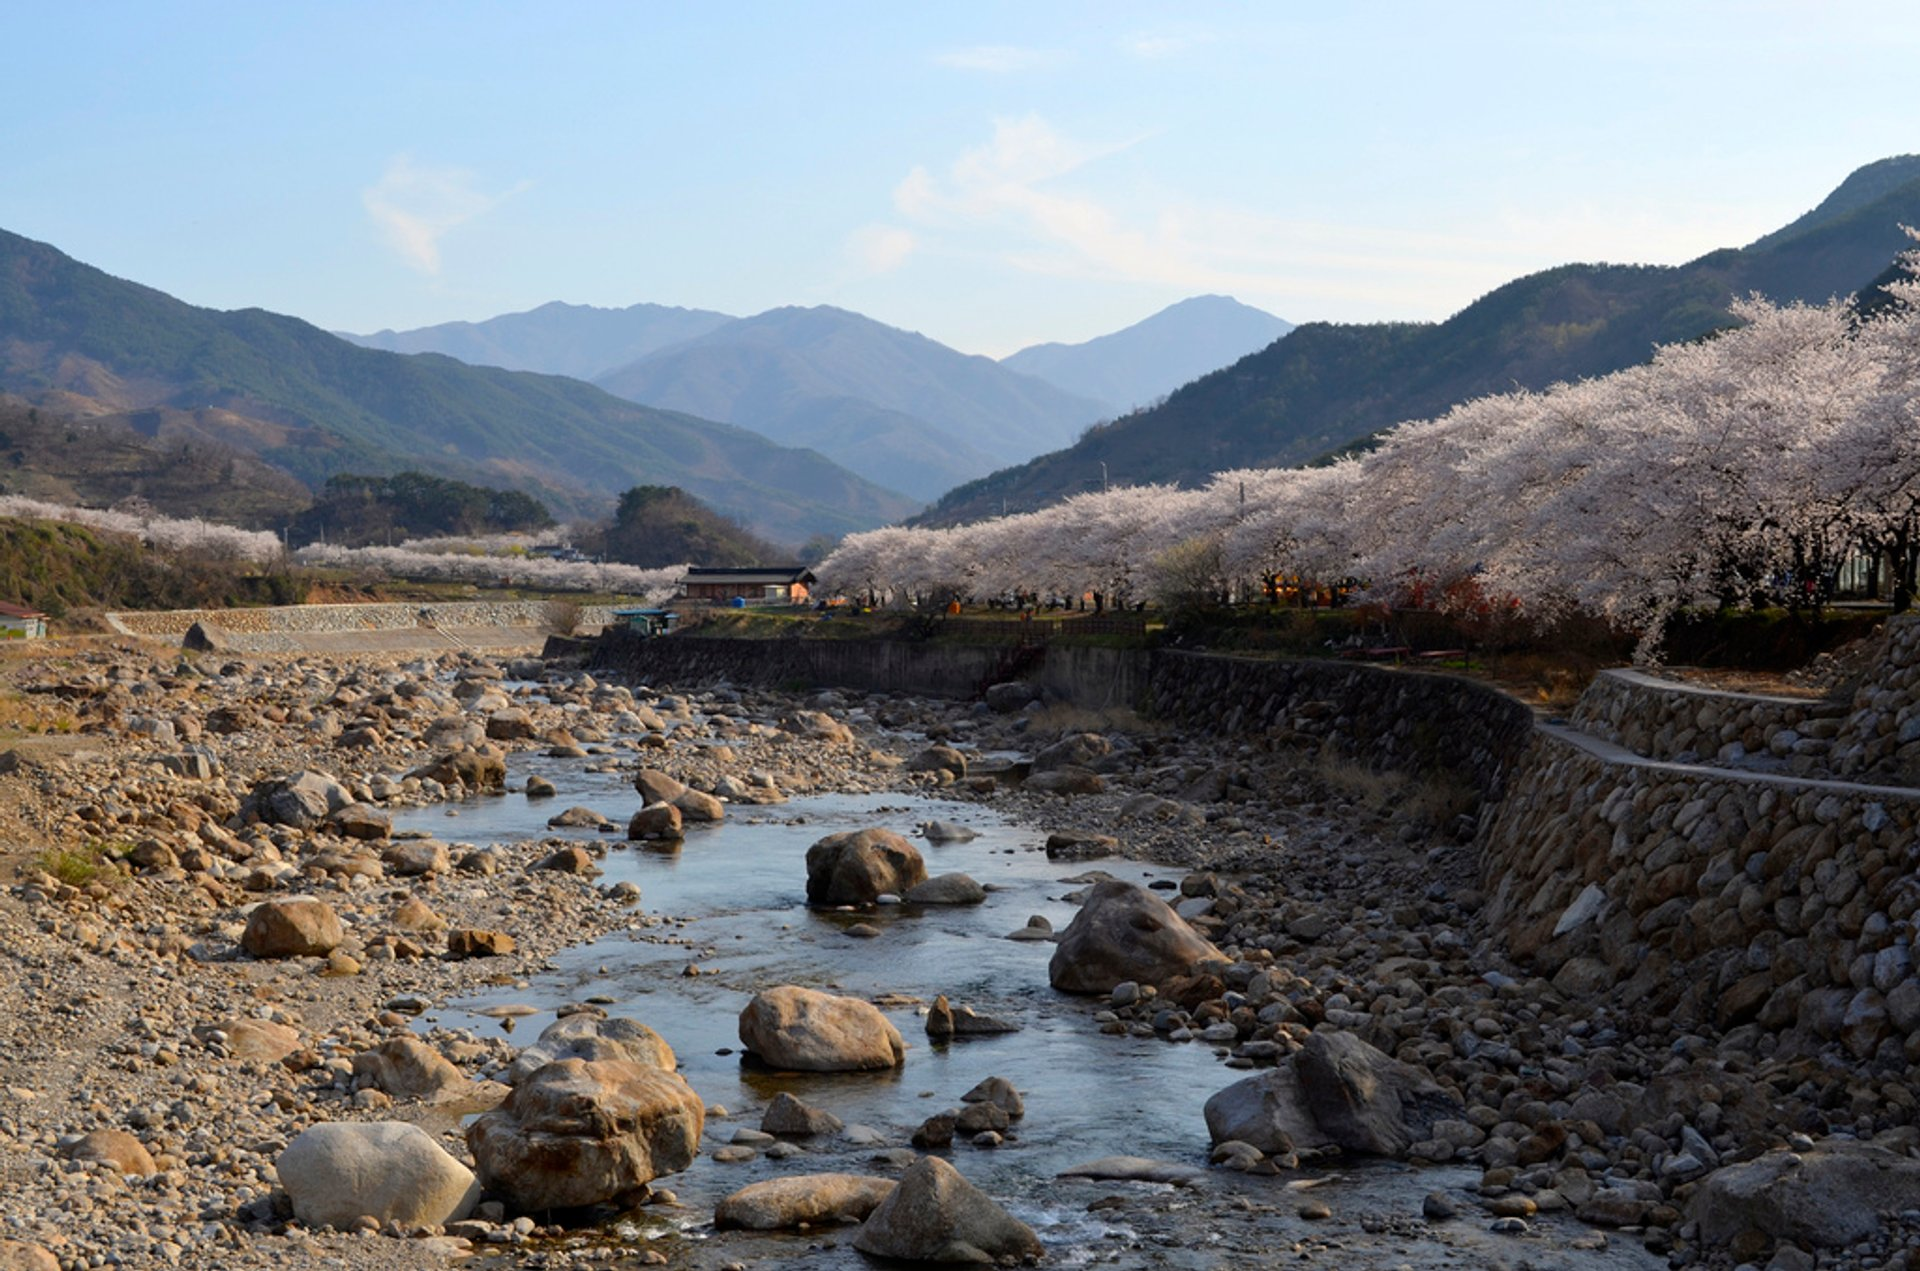 Cherry Blossoms, Hwagae-myeon, Hadong-gun, Jeollanamdo 2020